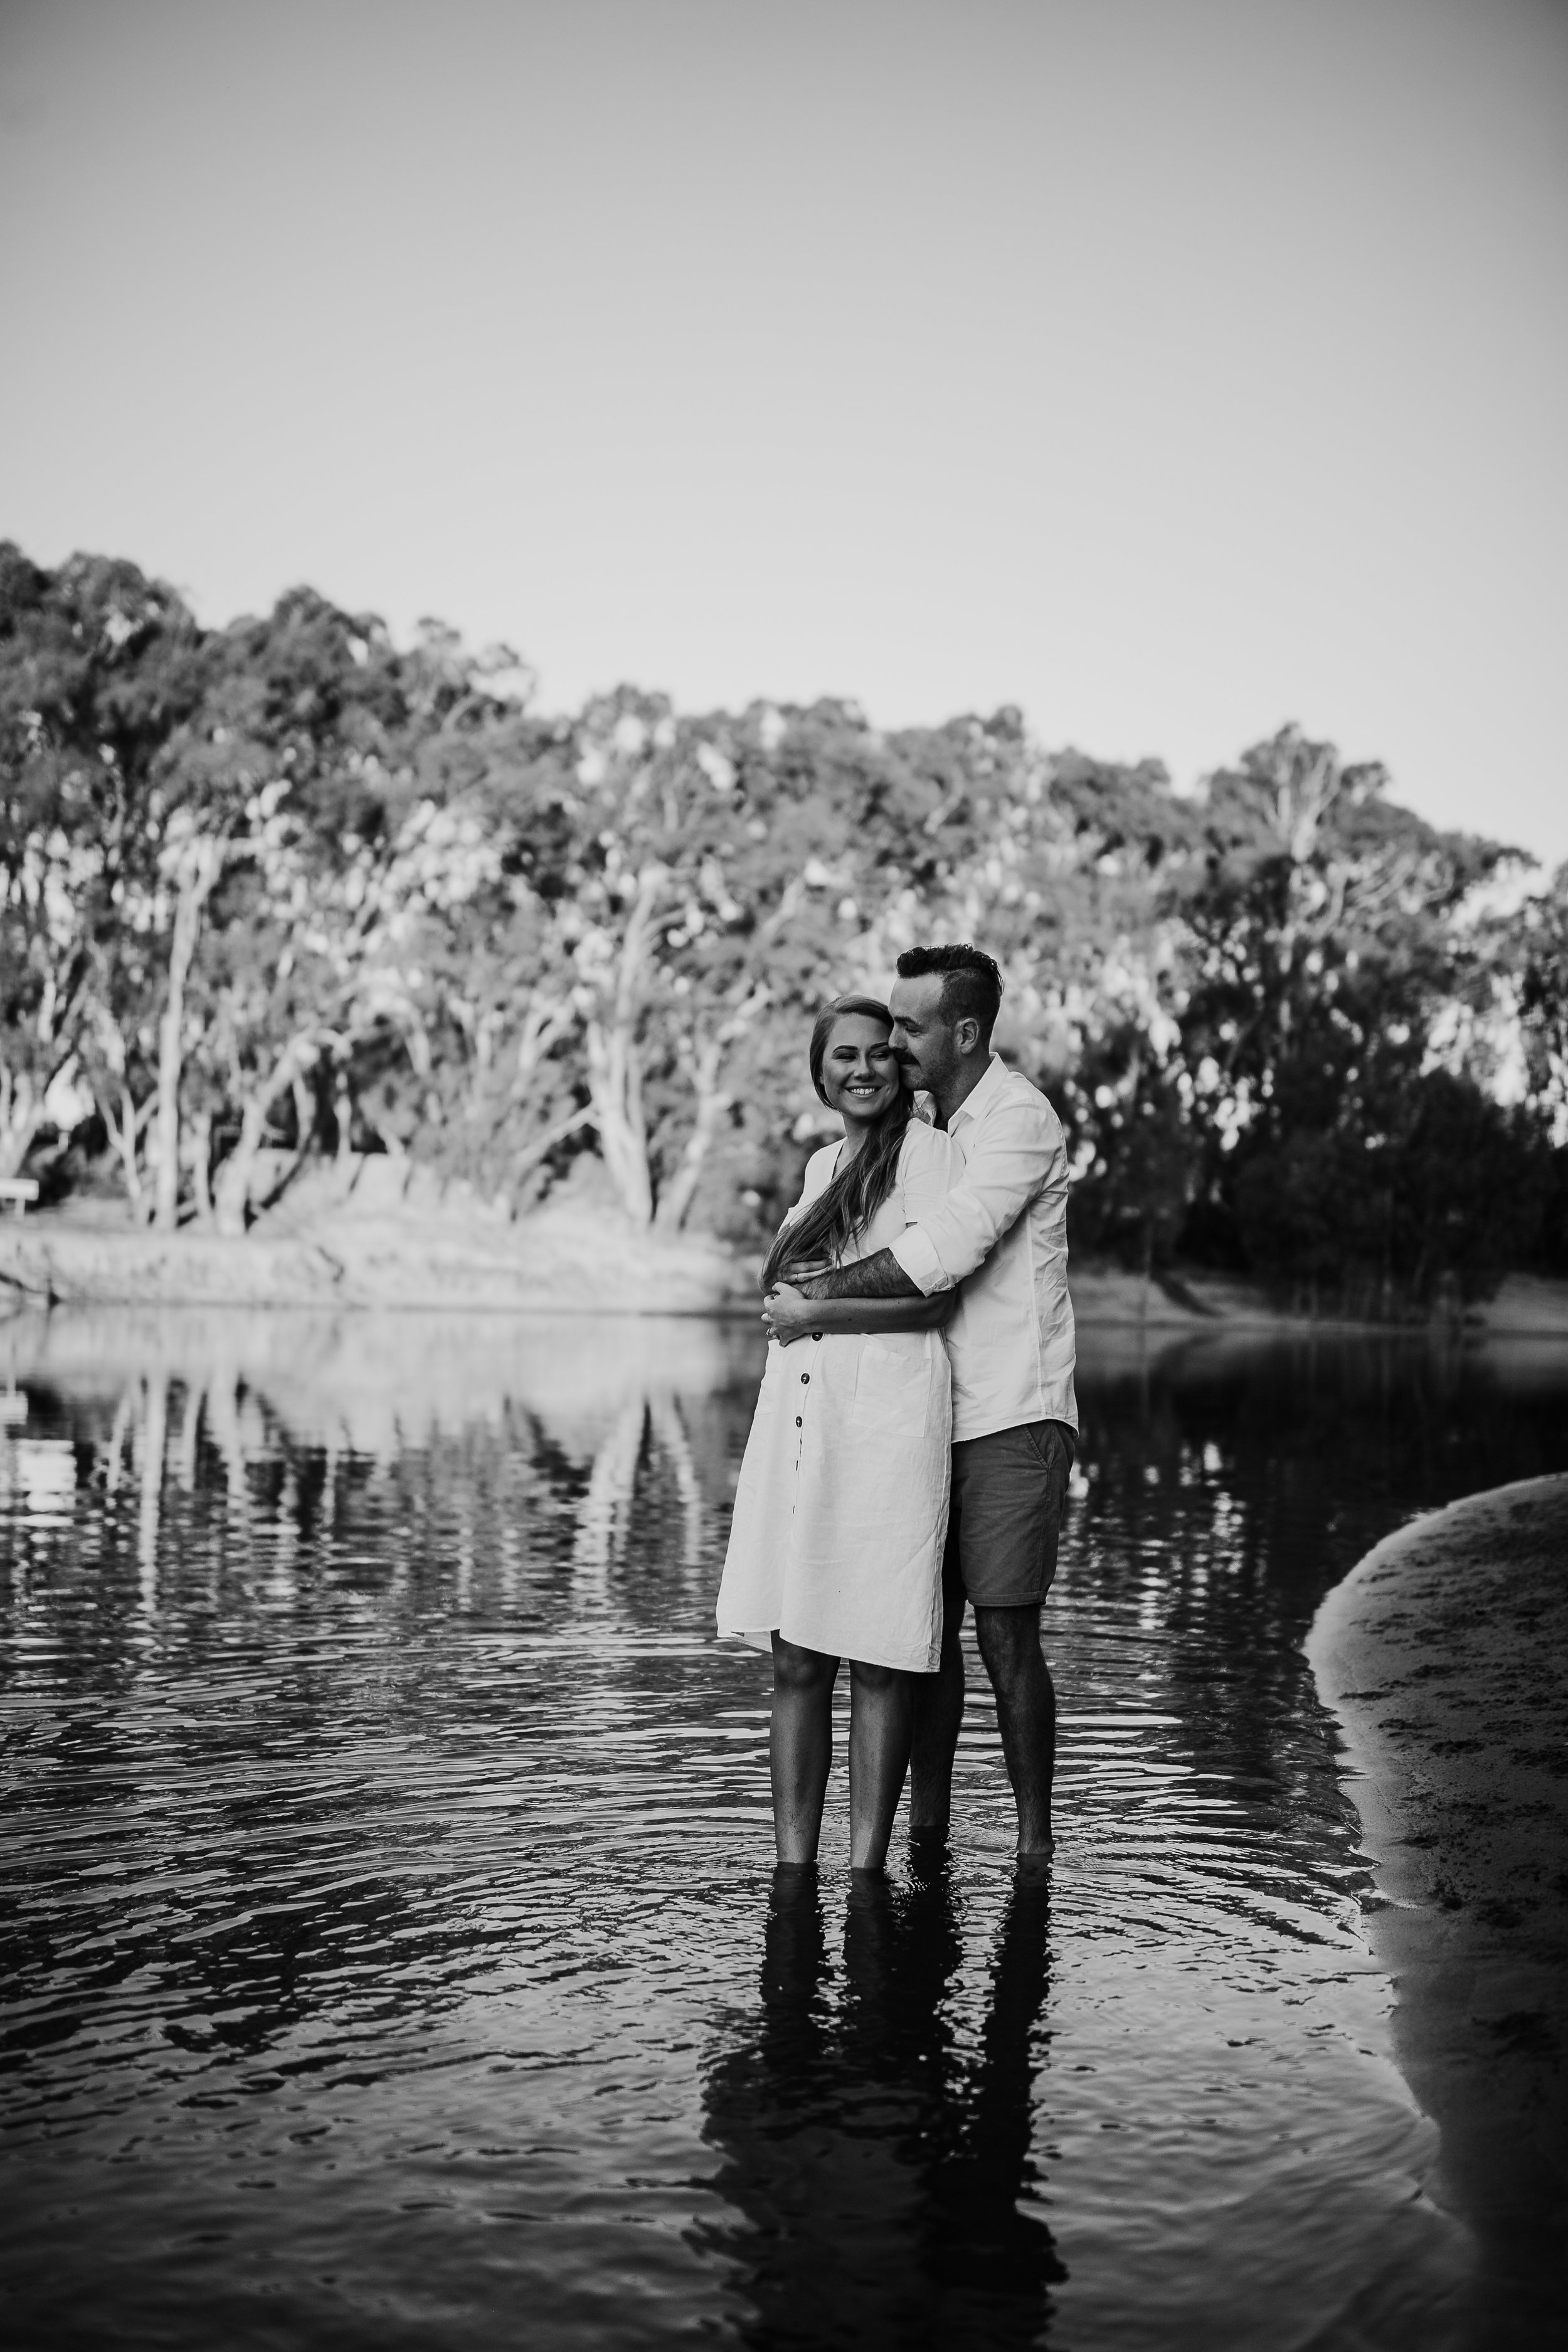 mickalathomas_puremacphotography_weddingphotographer_couplephotographer_Sheppartonphotographer_2839.jpg